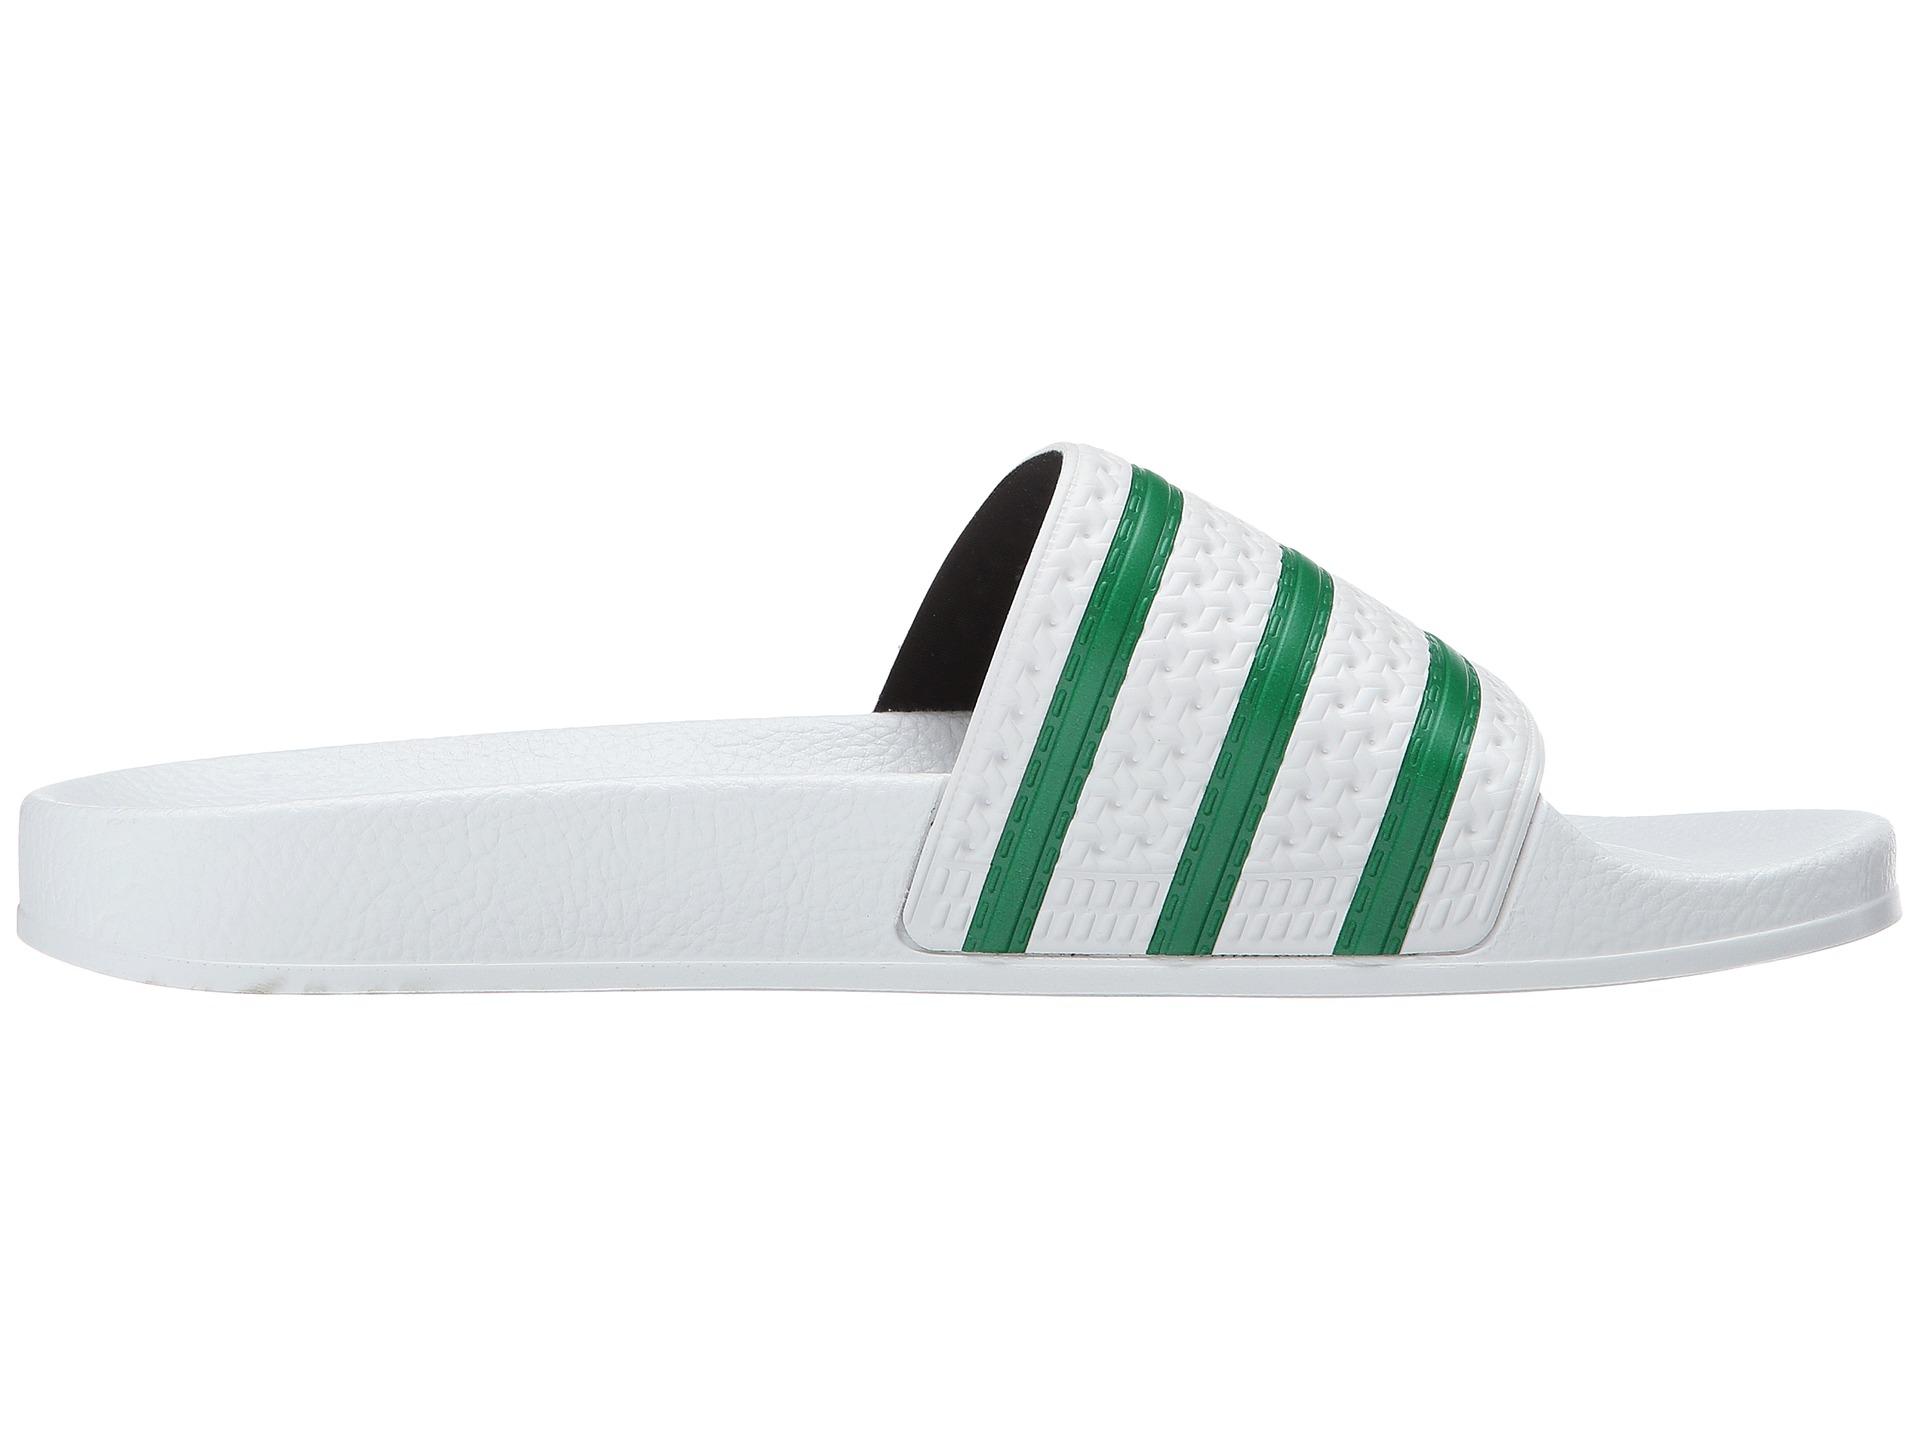 6d13e5384 Lyst - adidas Originals Adilette in Green